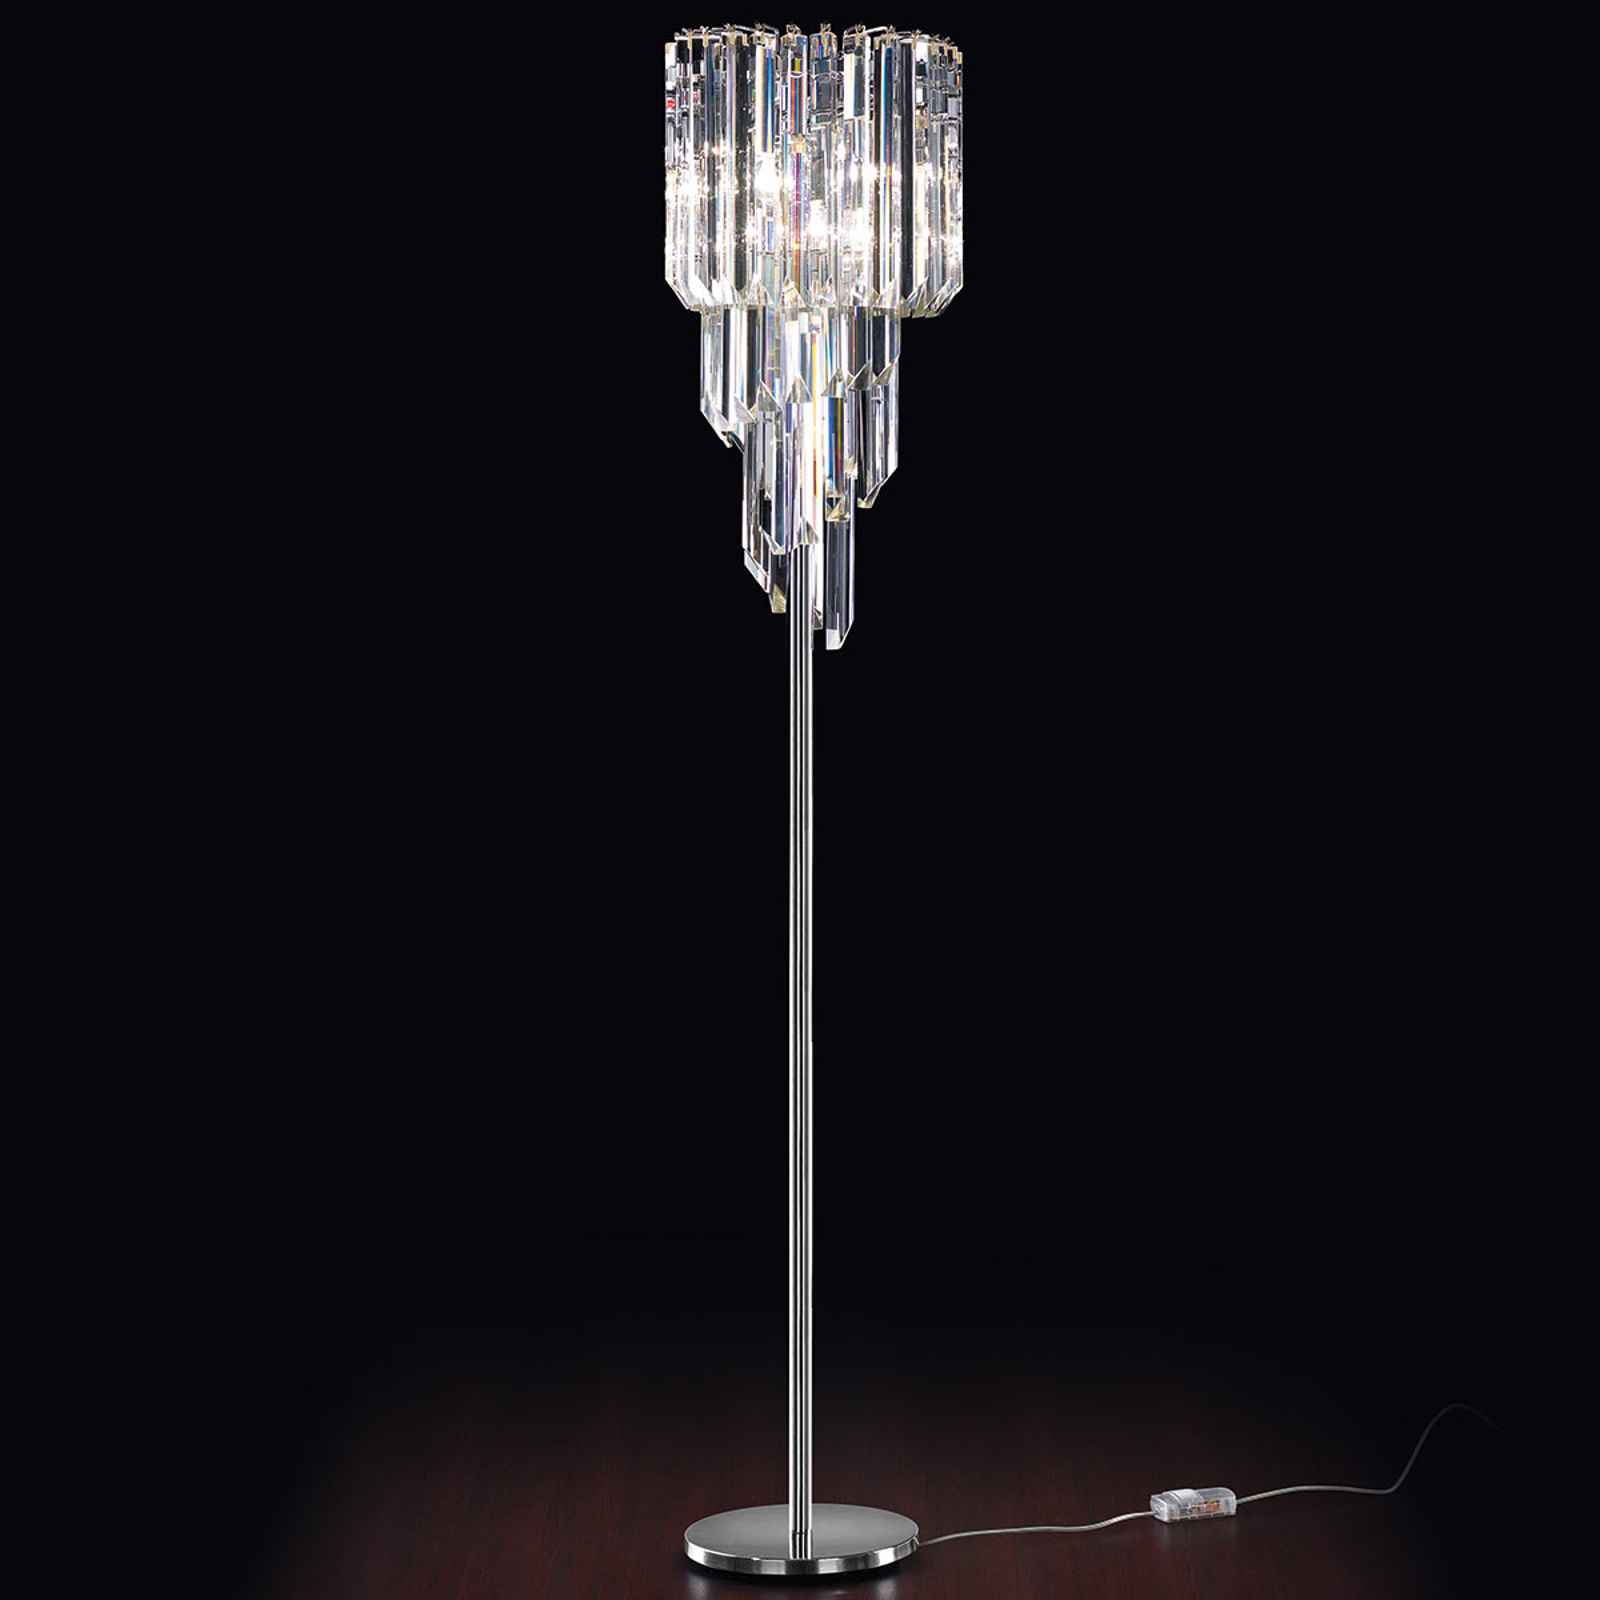 CRISTALLI lampa stojąca ze szlach. szkłem Murano